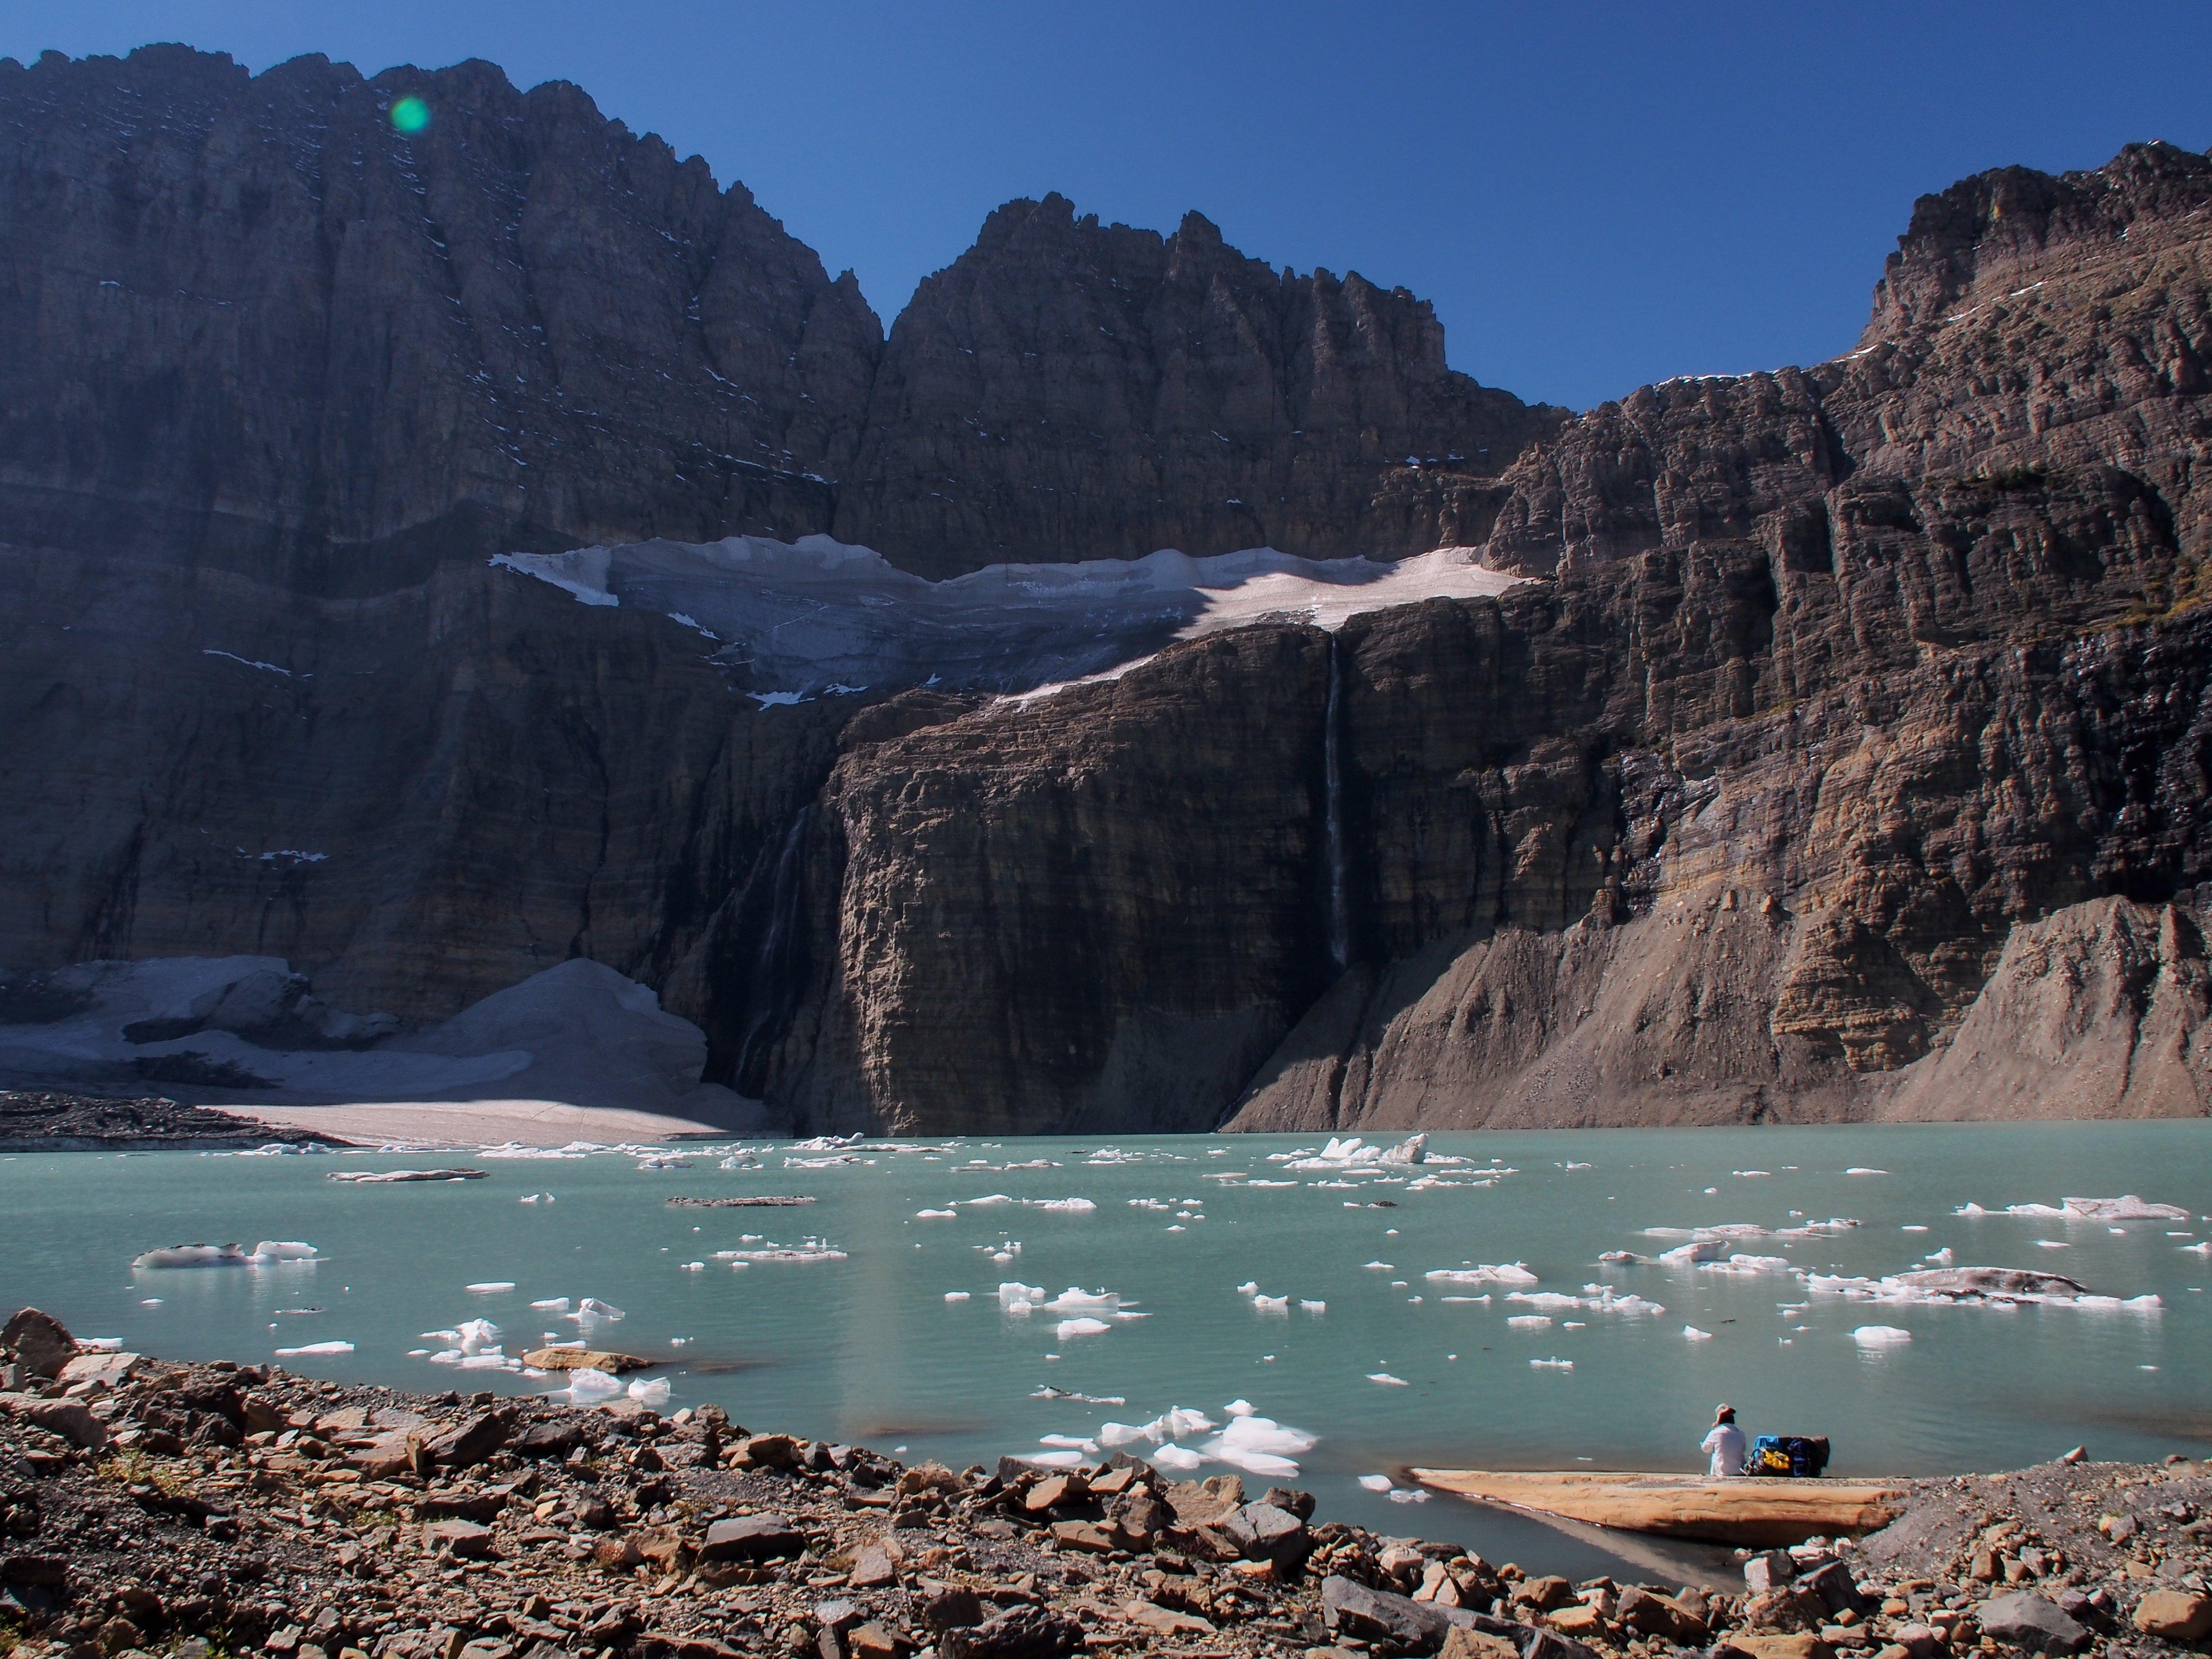 Grinnell Glacier - Glacier Waterton National Park - Montana